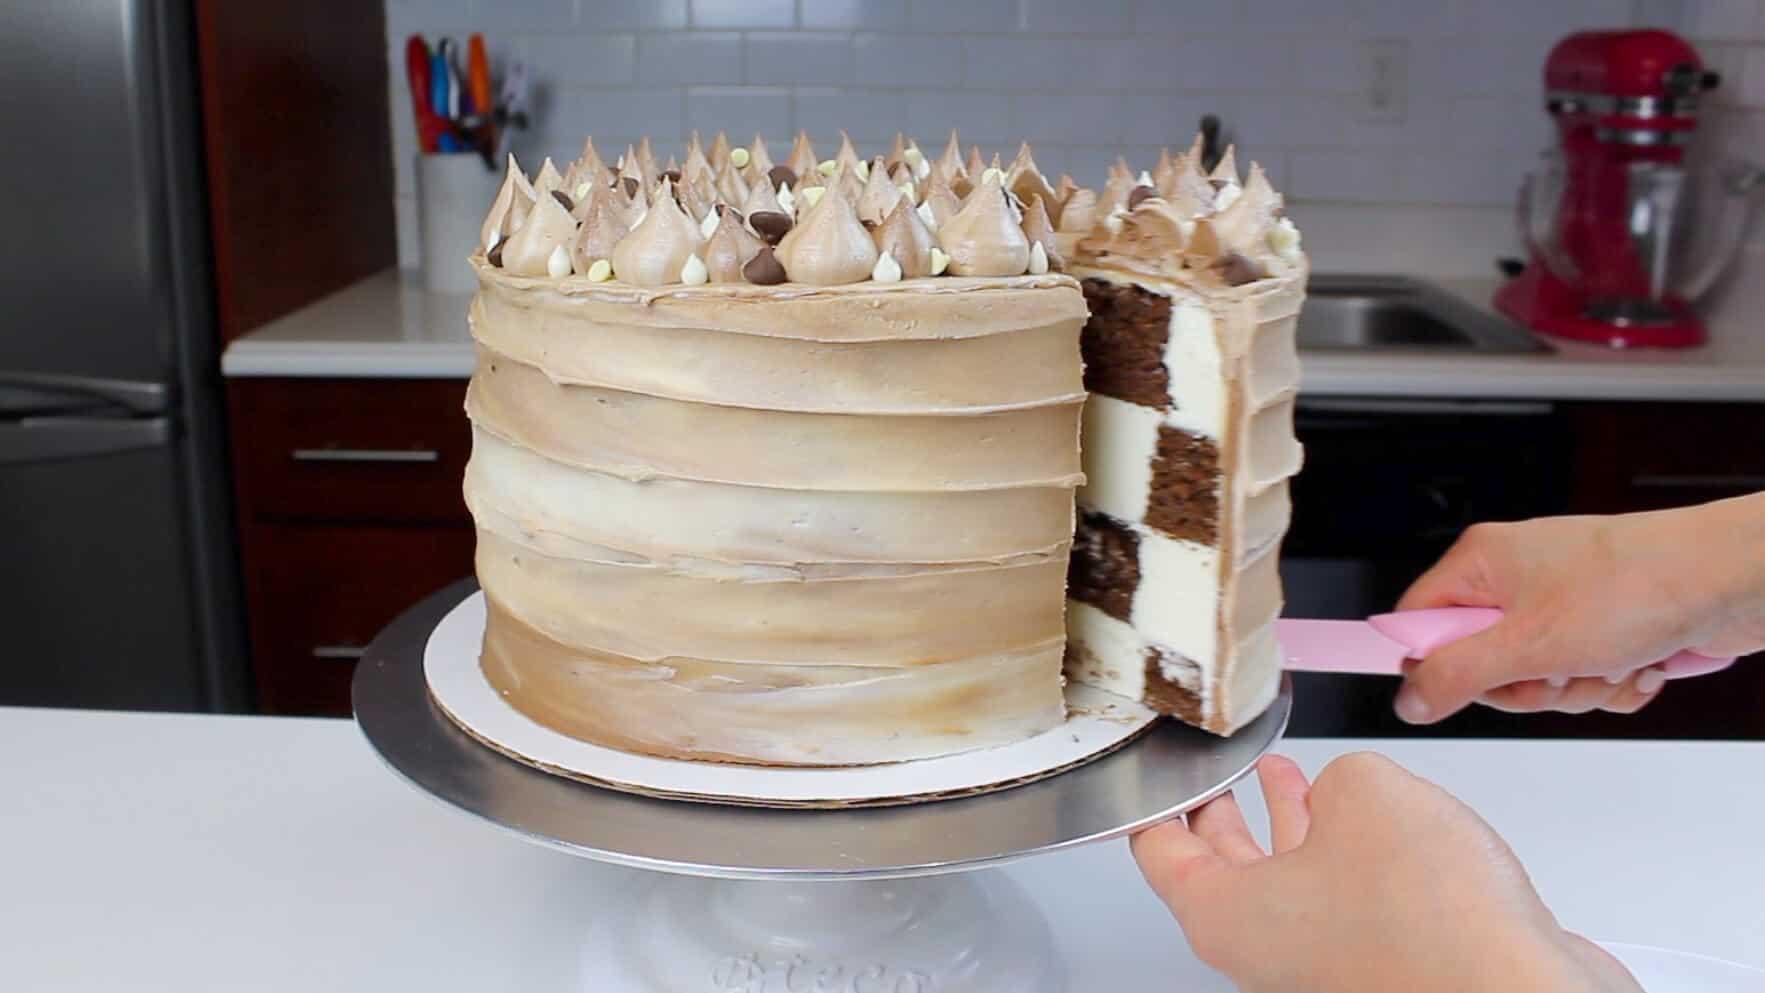 sneak peak at inside of cut checkerboard cake-2